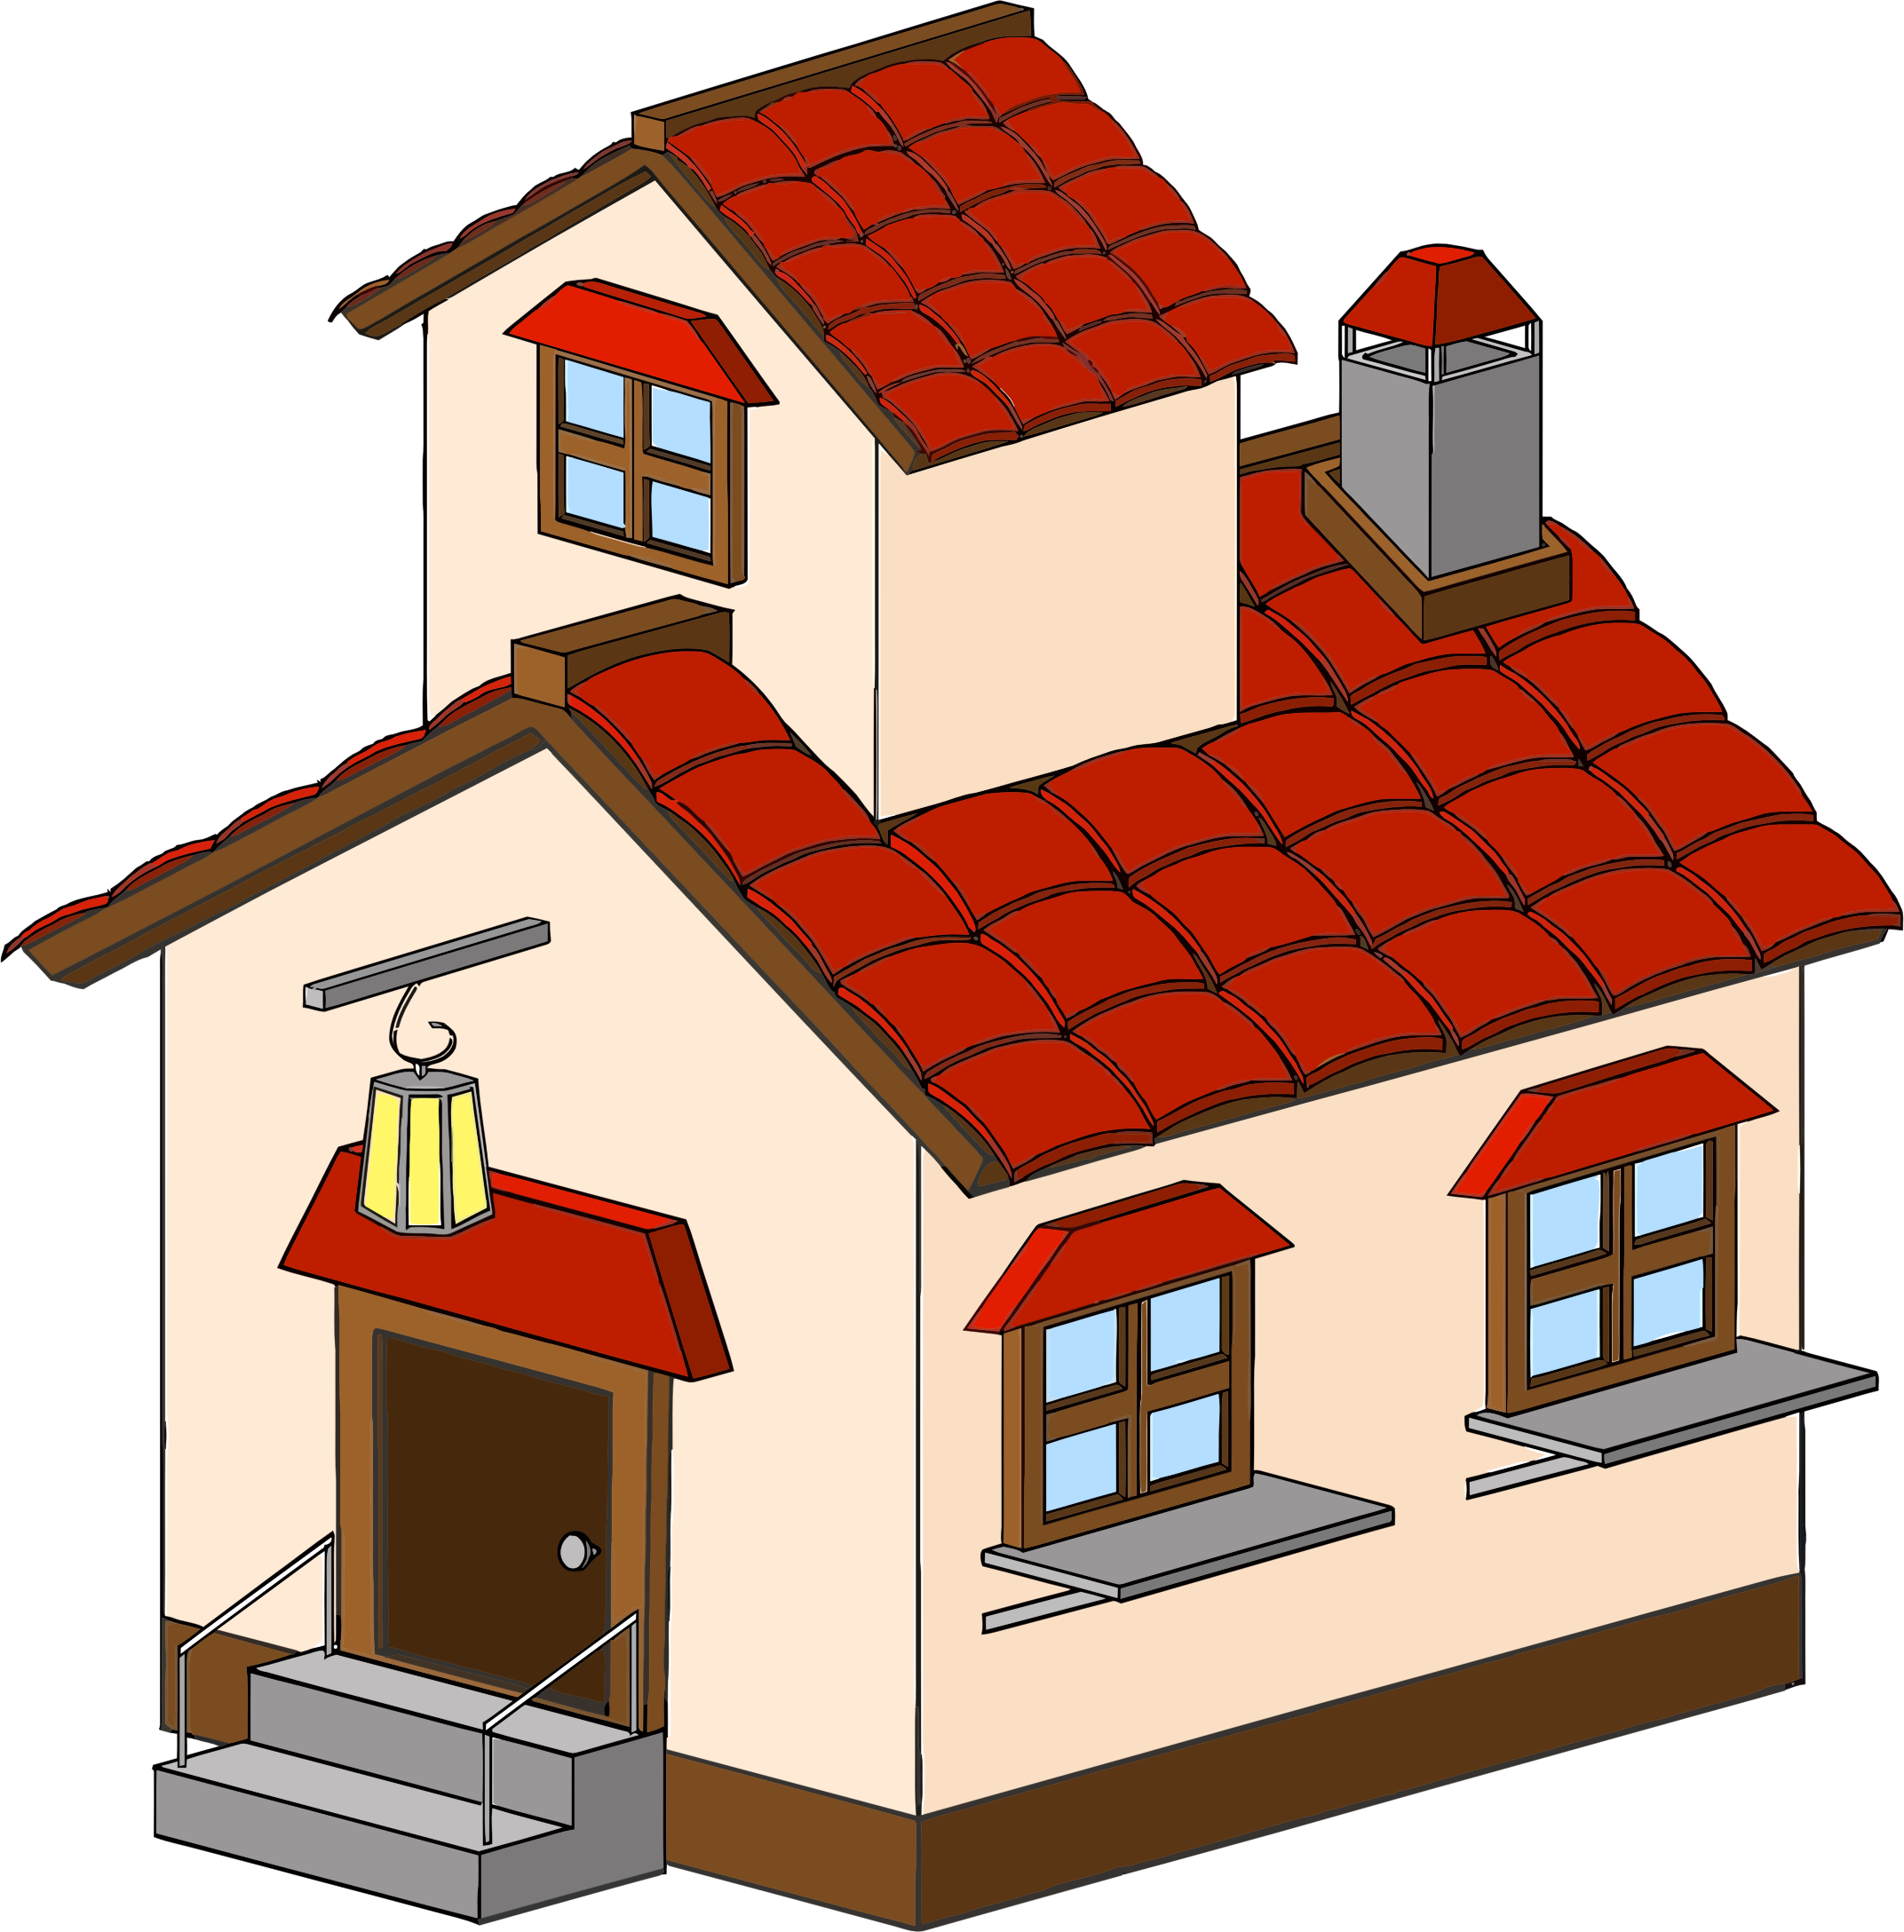 2144x2176 House Clip Art Clipart 4